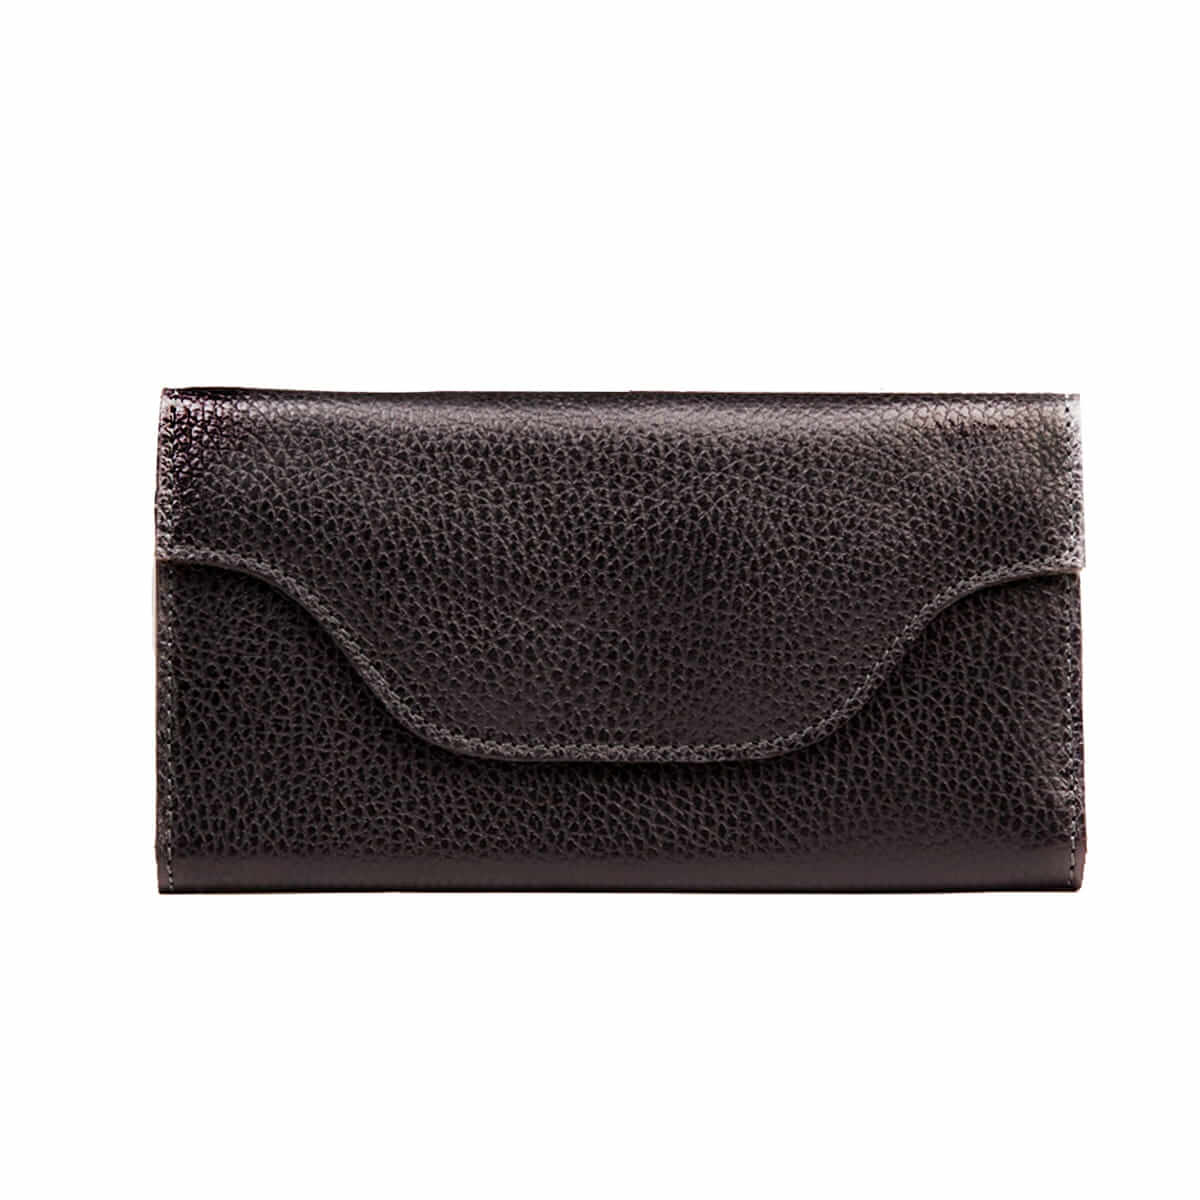 MY CARRY BAG Wallet Large (RFID) - rambler black